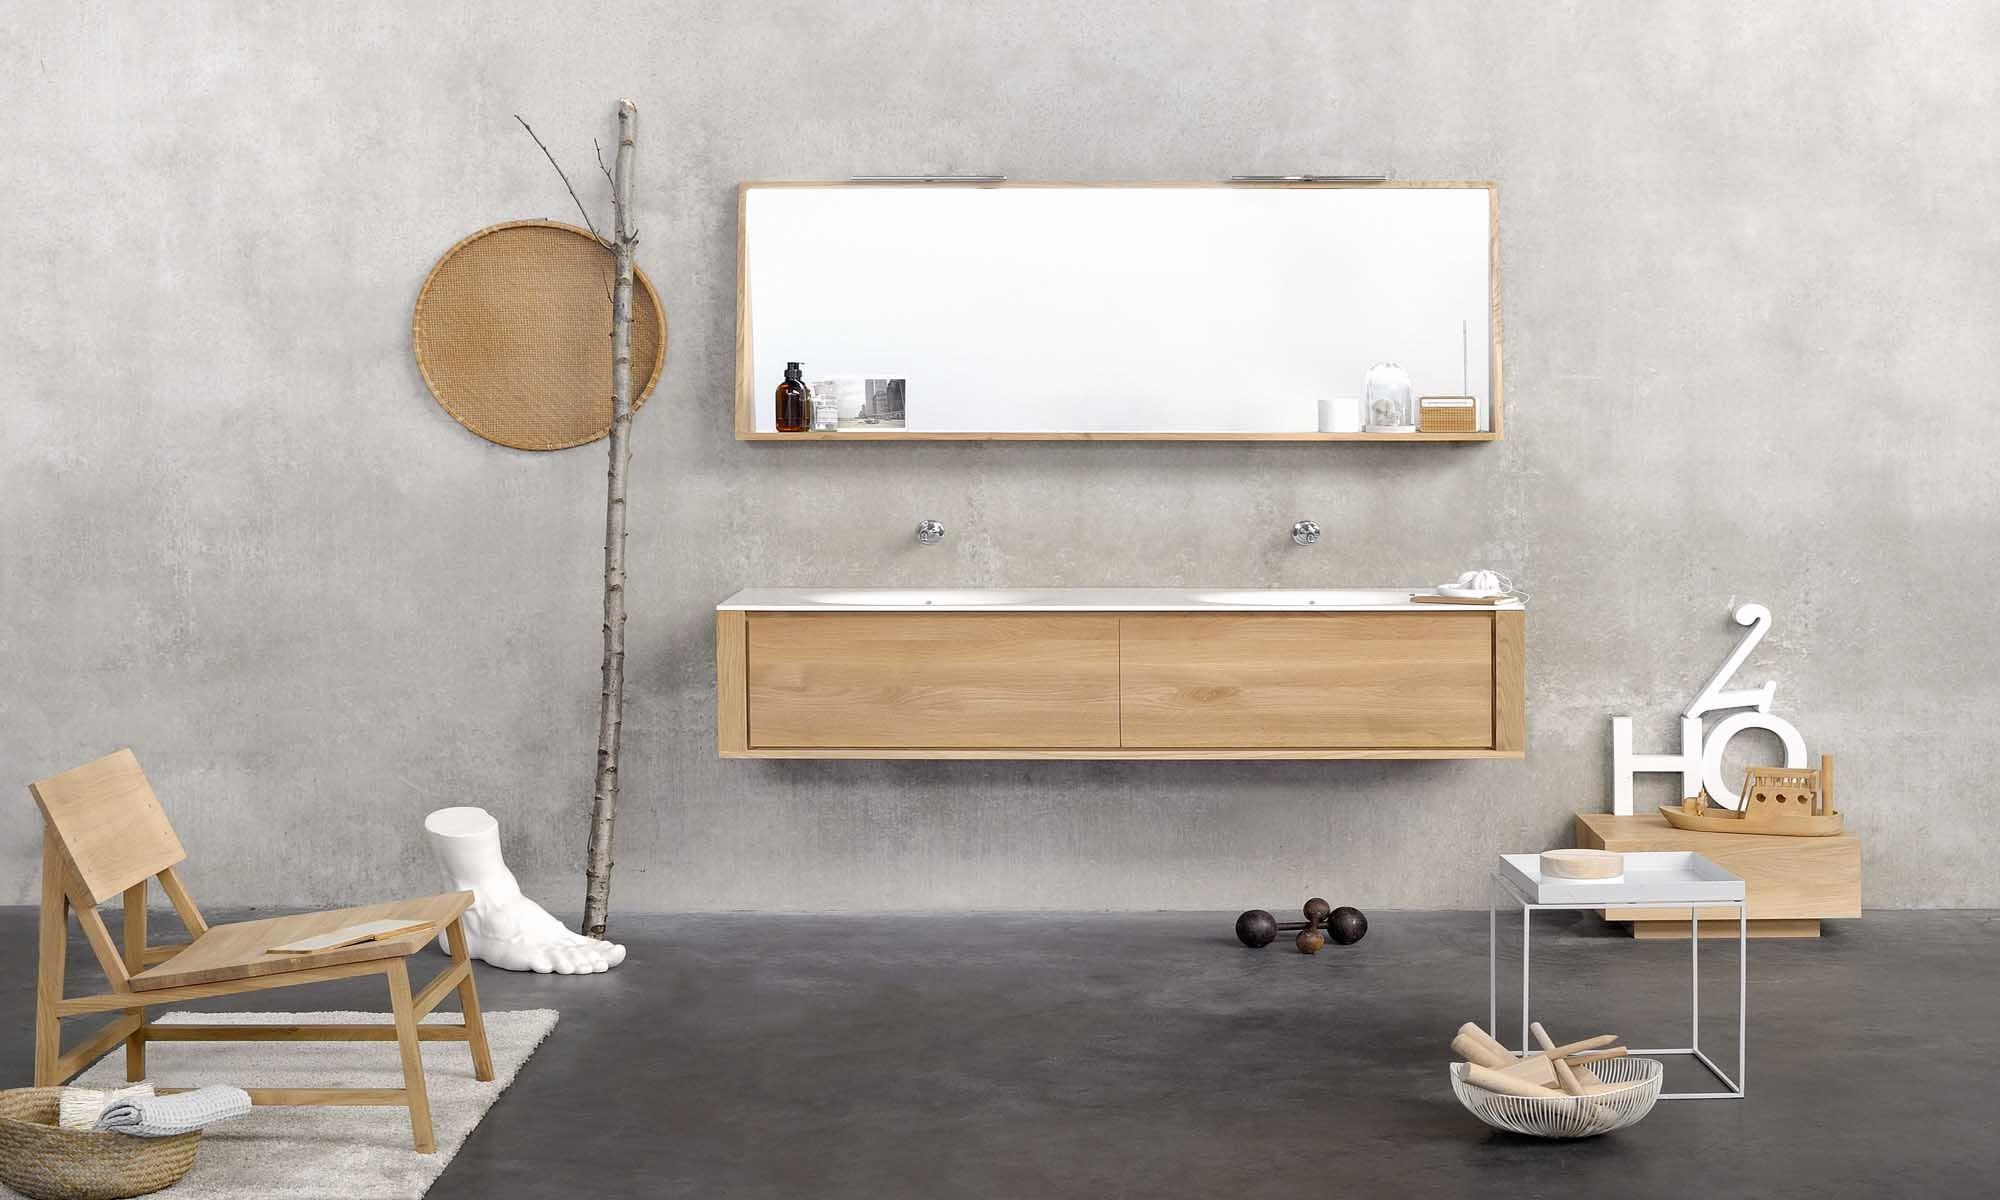 Ethnicraft grijze vloer houten meubel spiegel in hout